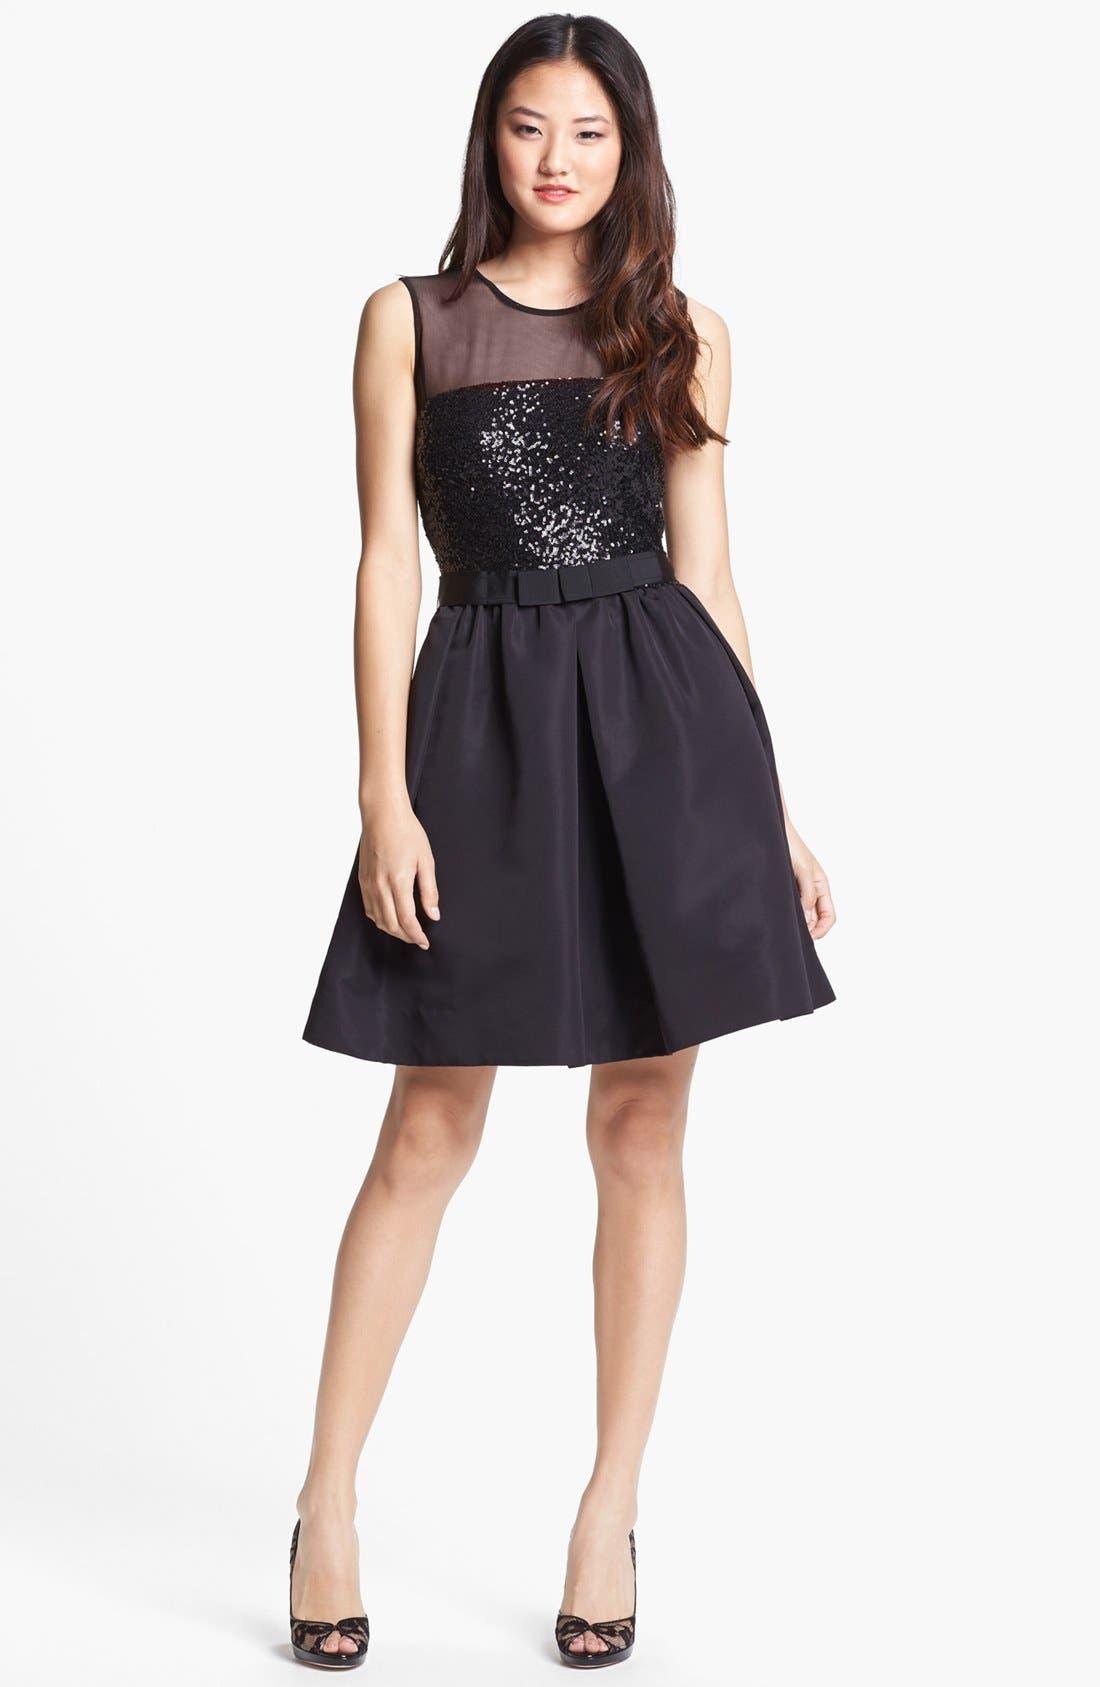 Main Image - Taylor Dresses Mixed Media Fit & Flare Dress